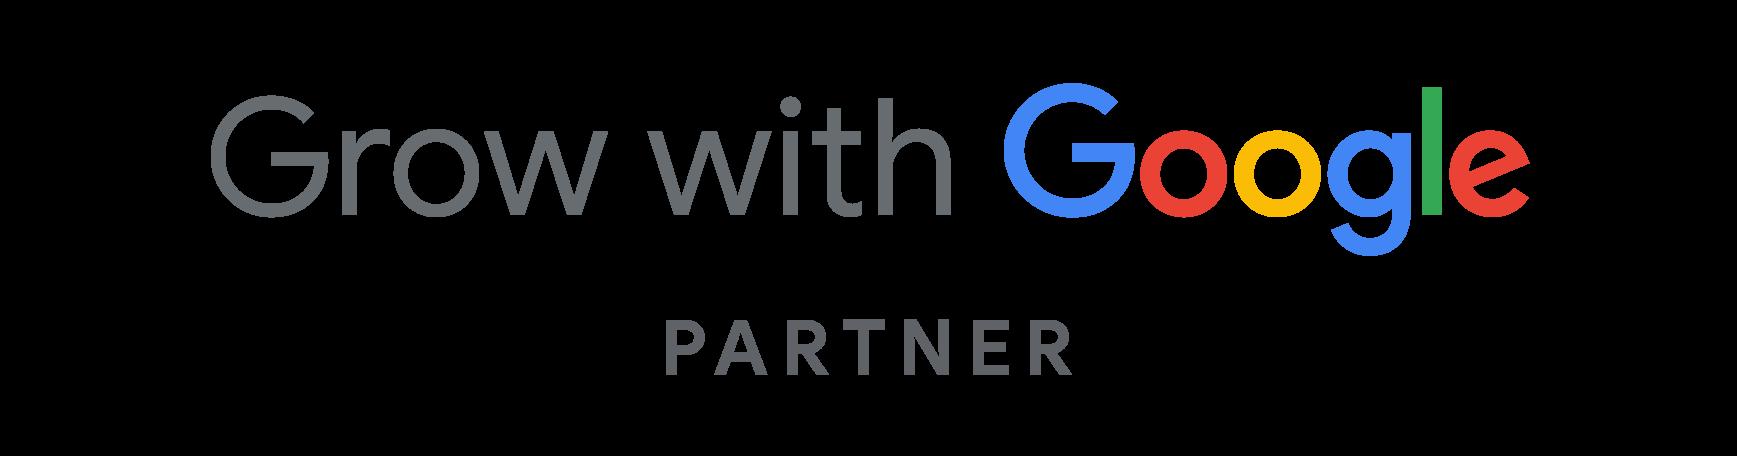 Grow With Google Partner Badge